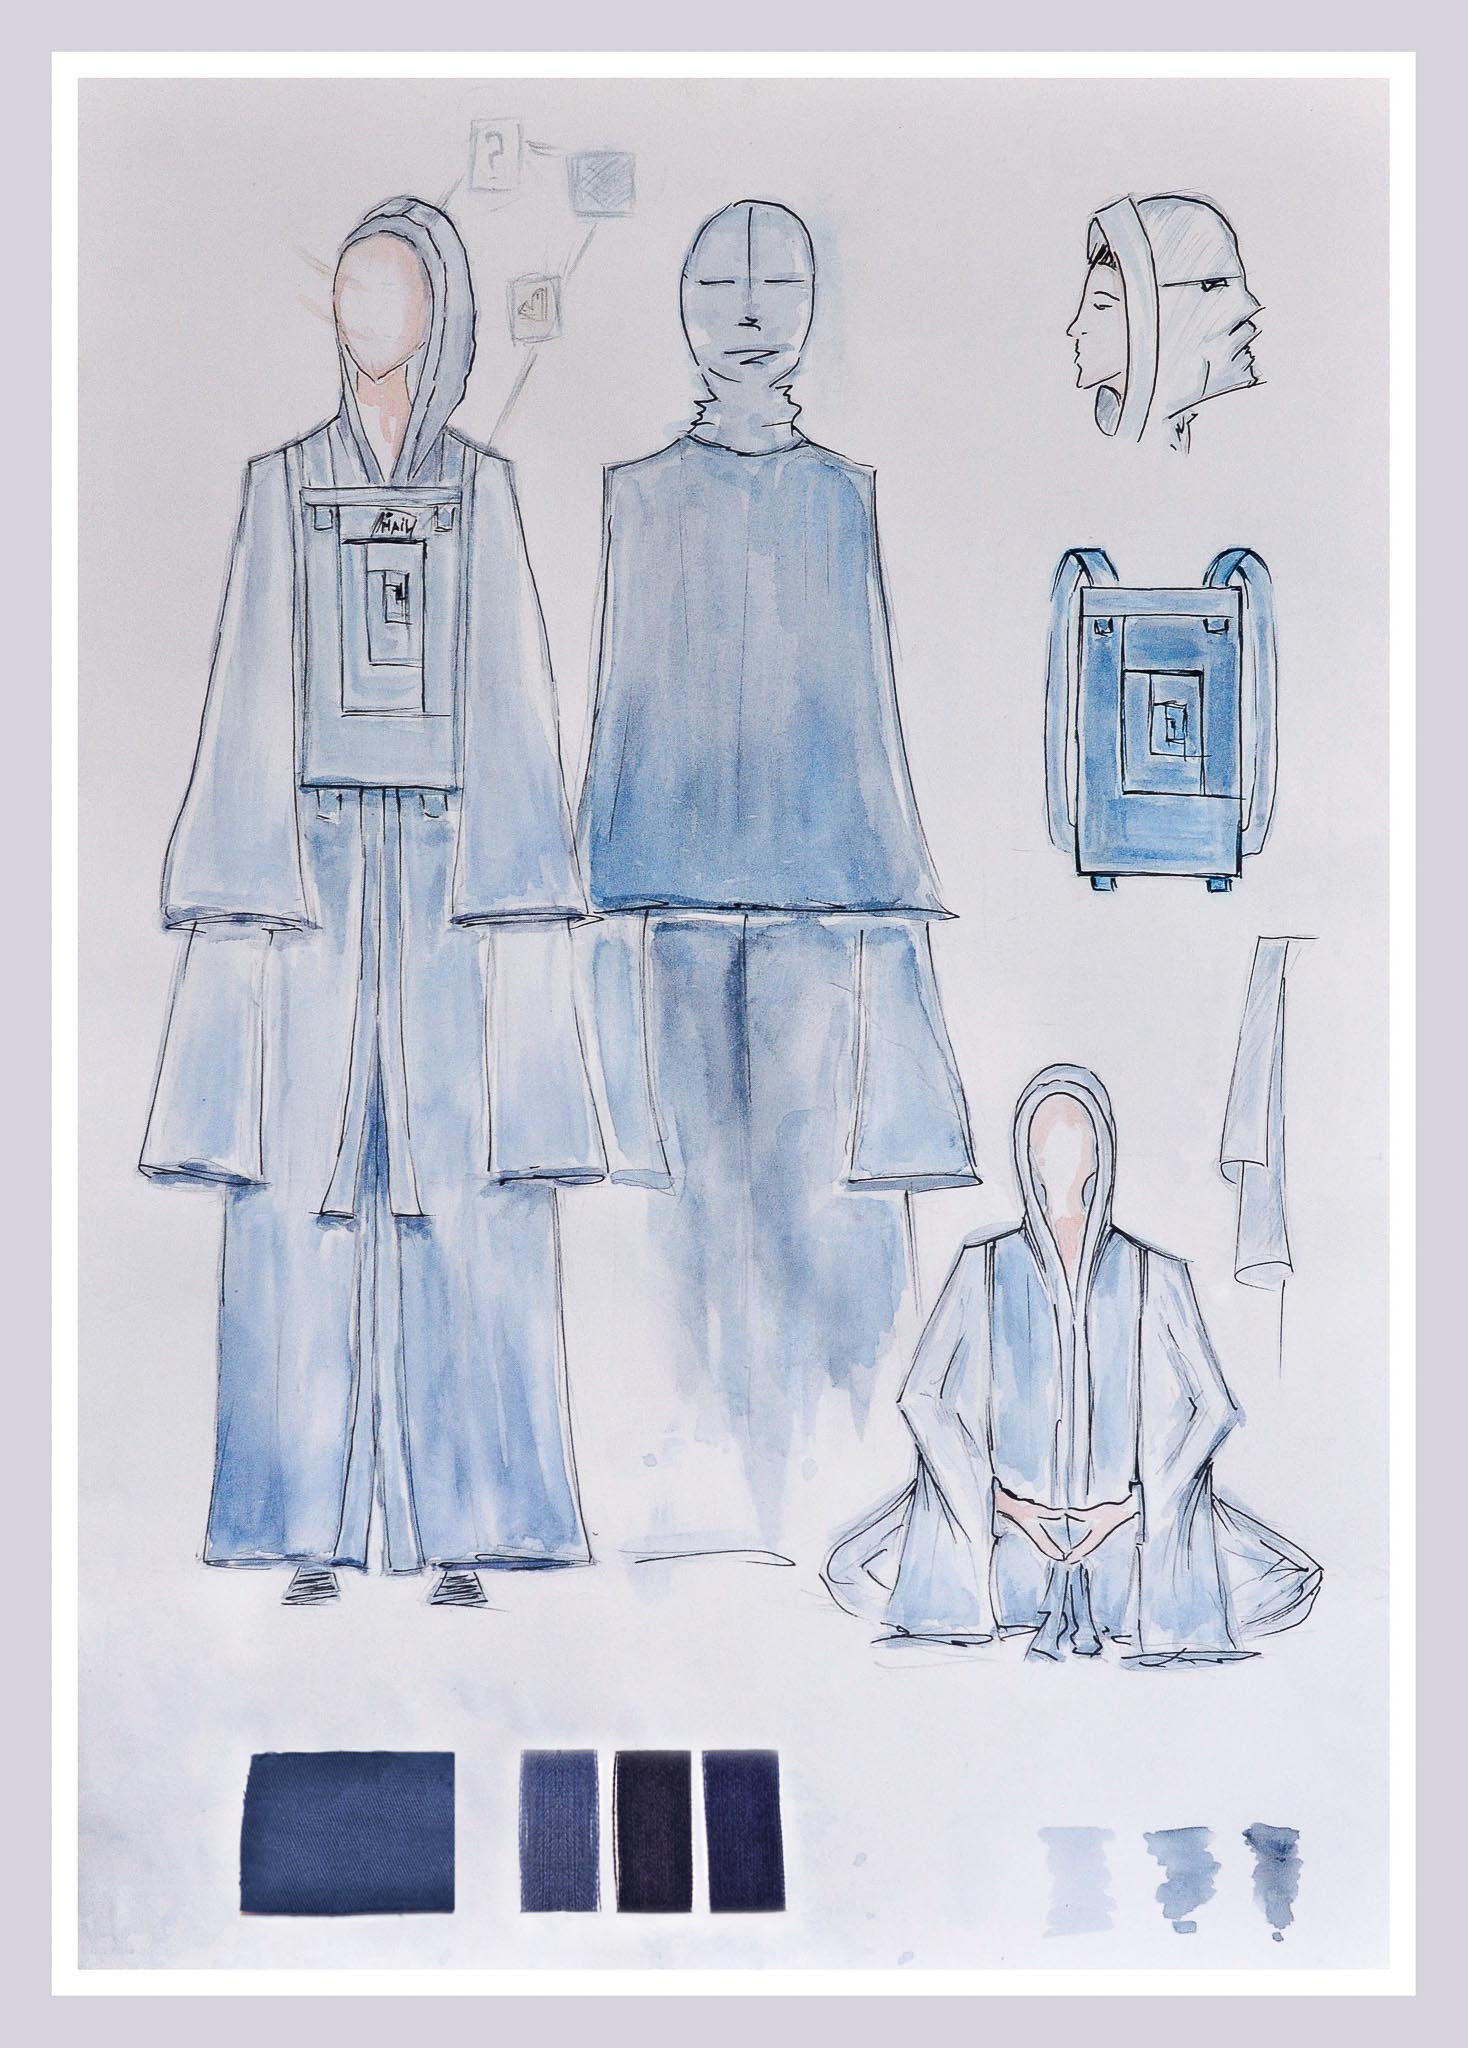 4D: DREAM DREAMS DIVING DEEPER: Olena Shutovska, Ukraine, Alumni, Academy Style & Design by André Tan (Dream your Dreams)